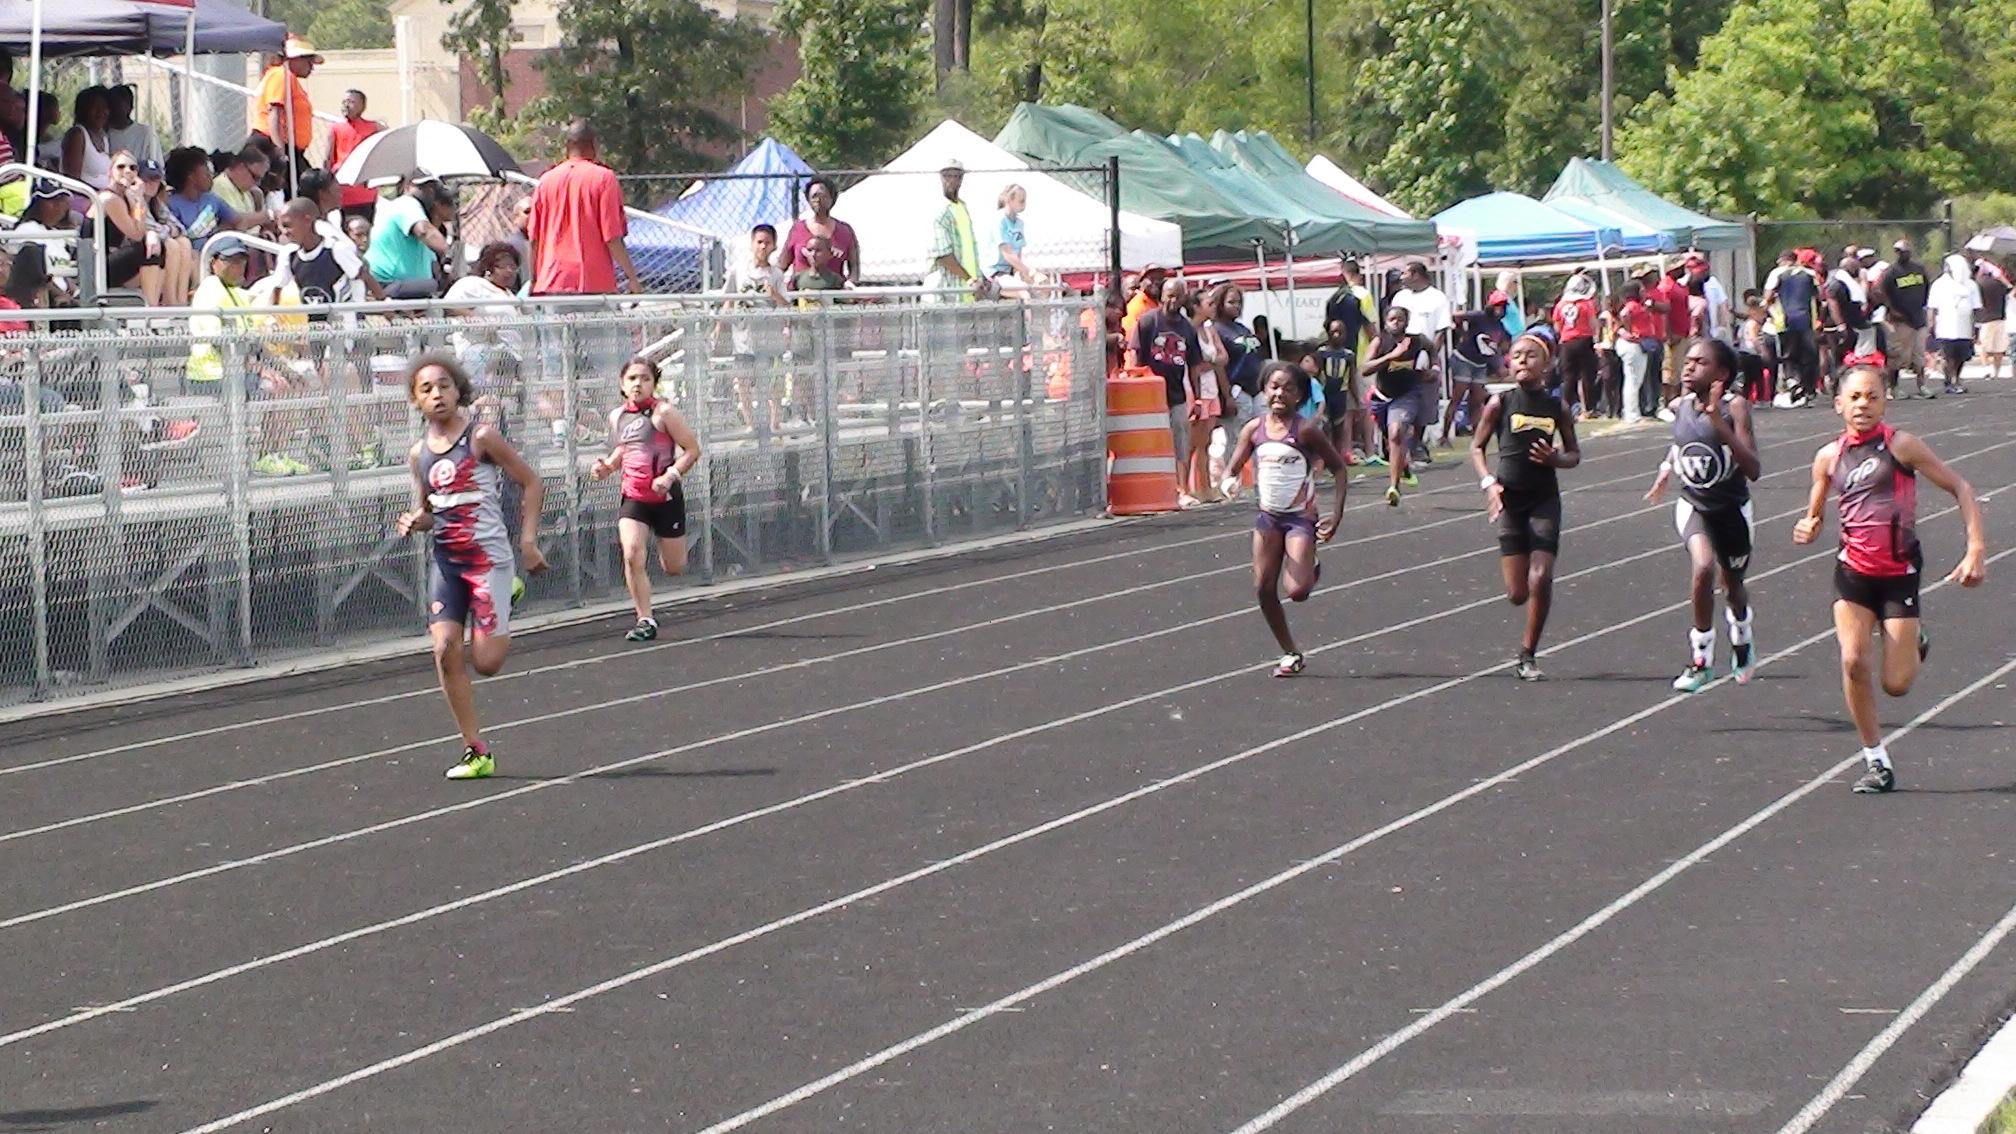 Ja'Queriyah running the 200m